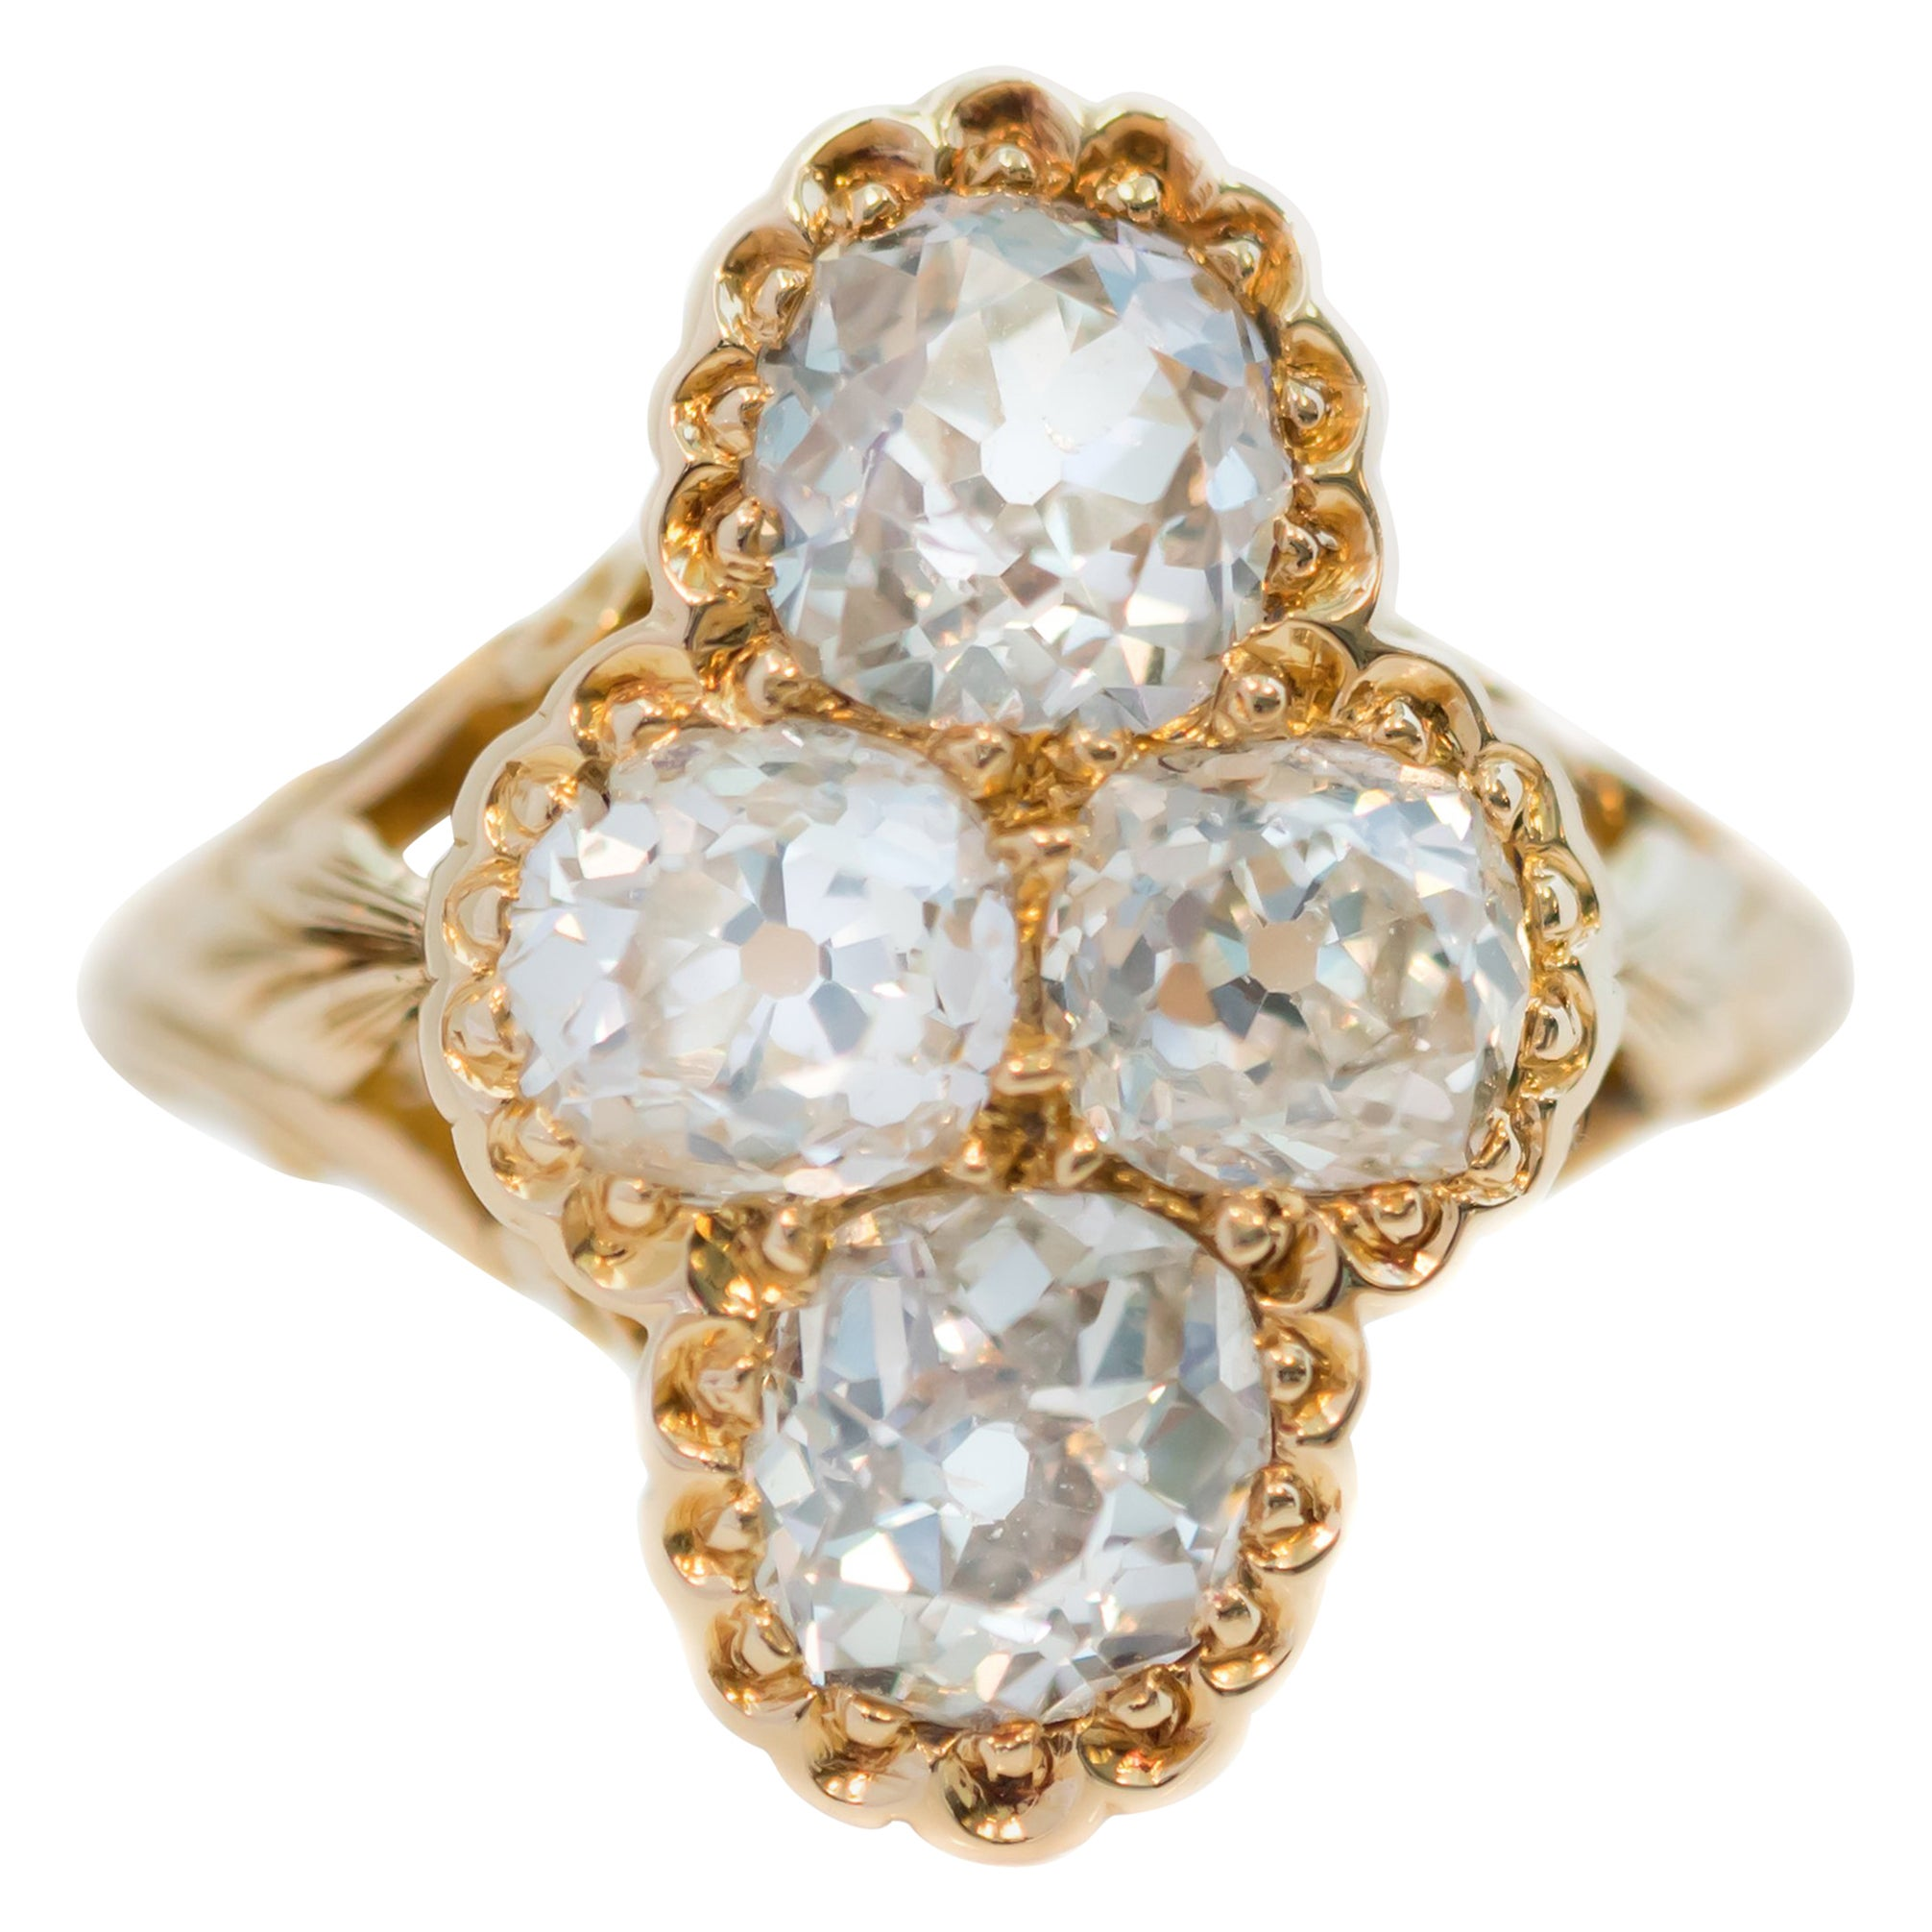 Victorian Antique 2.2 Carat Old Mine Diamond and 18 Karat Yellow Gold Ring